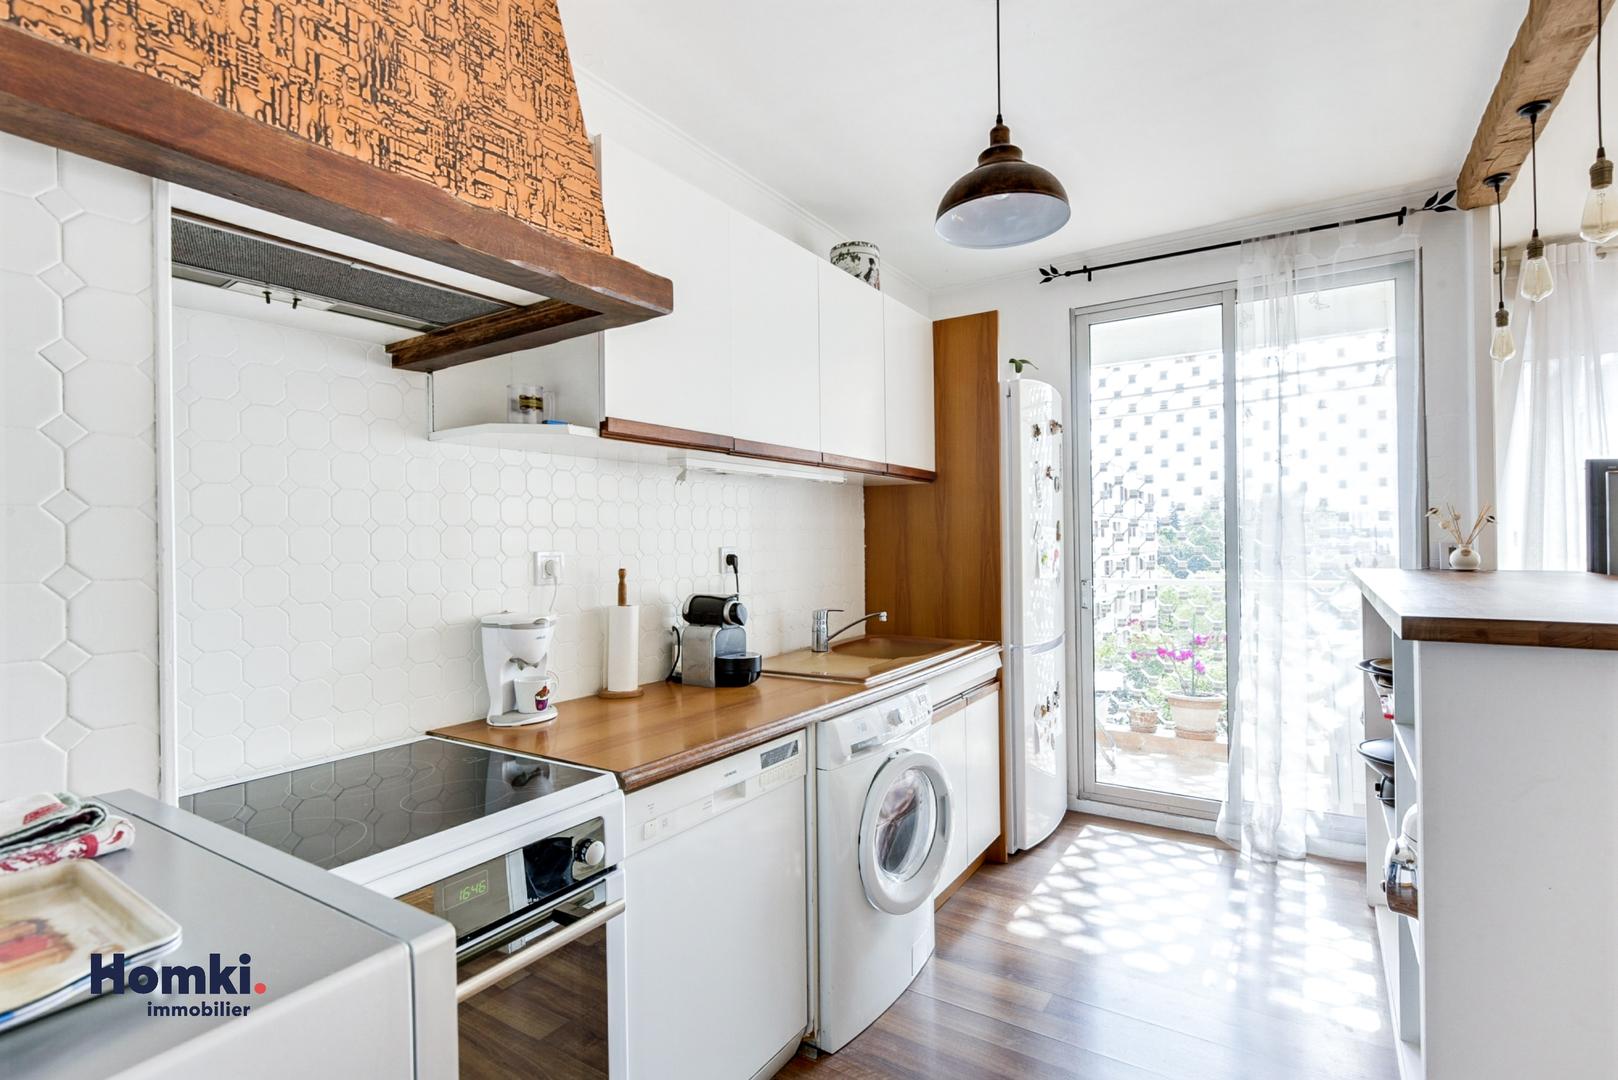 Vente appartement MArseille 13010 T5_6